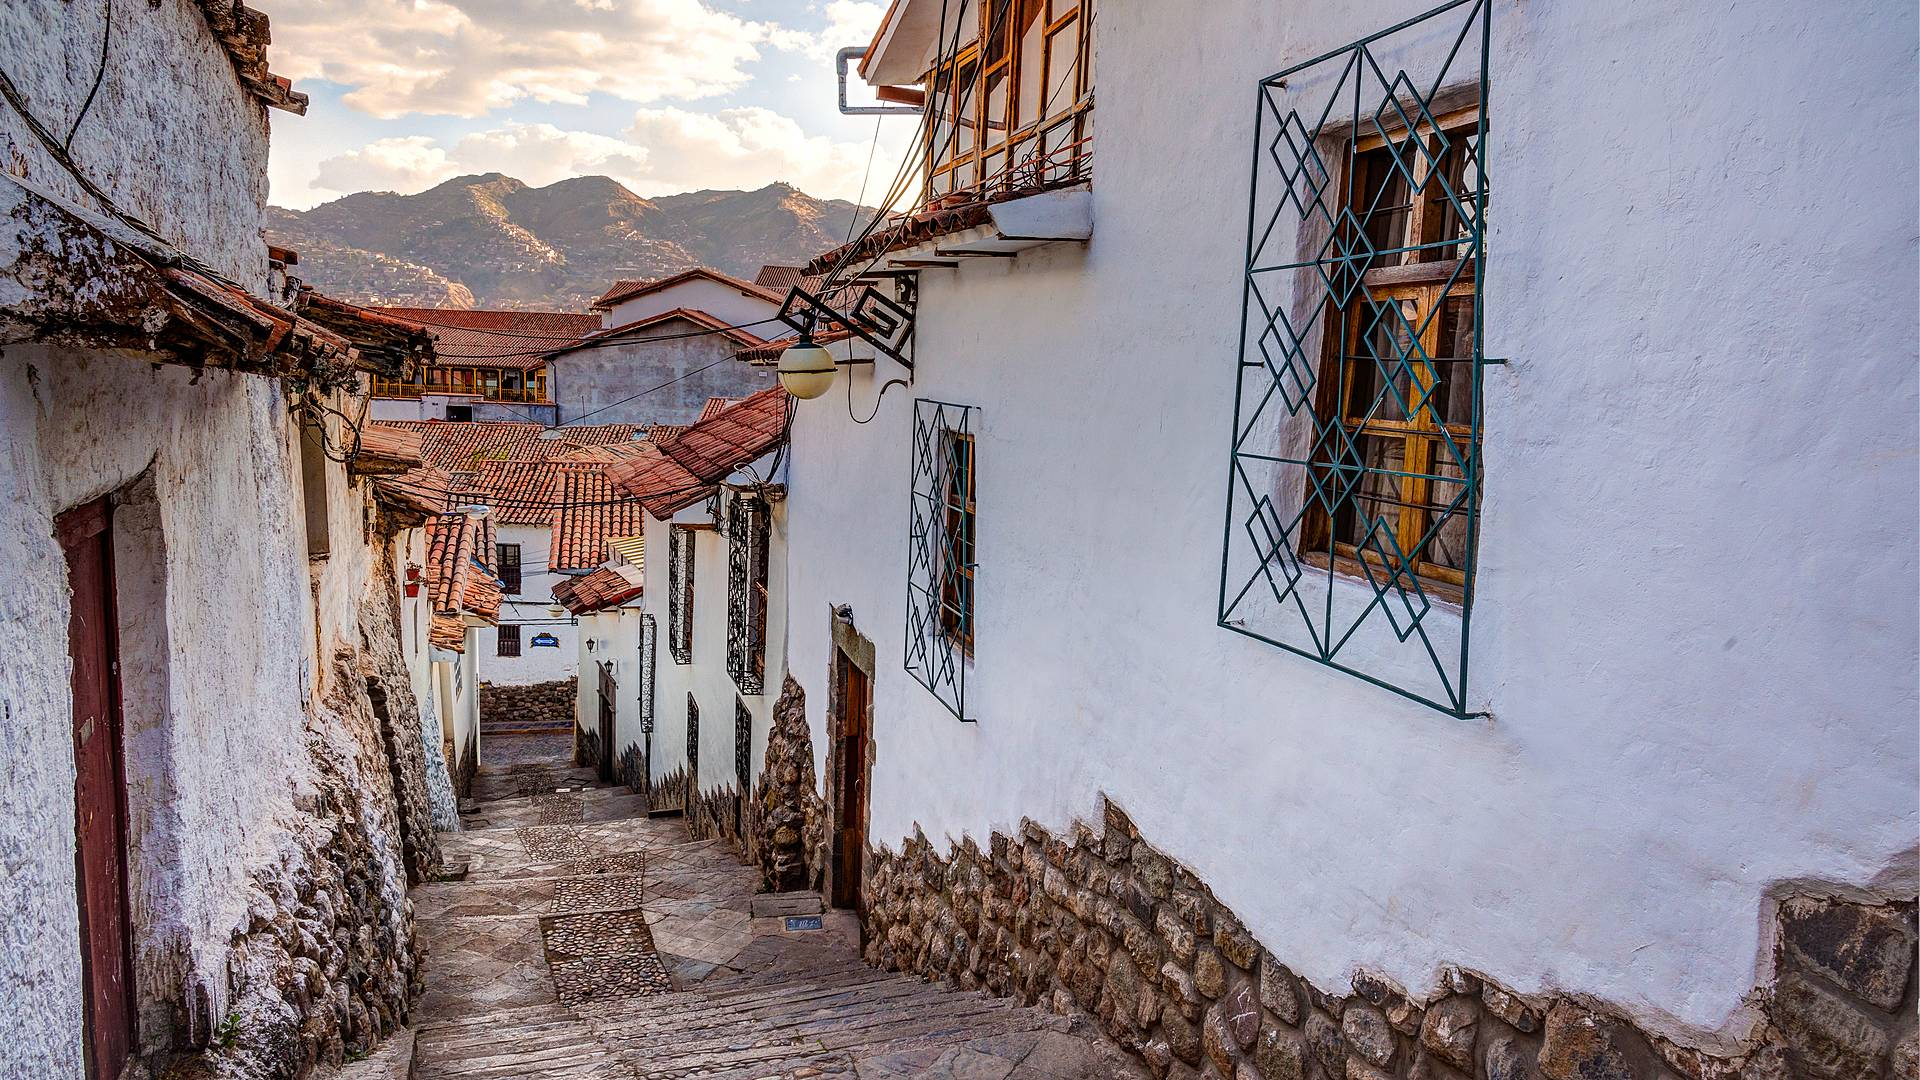 Lima, Cusco e Machu Picchu andata e ritorno